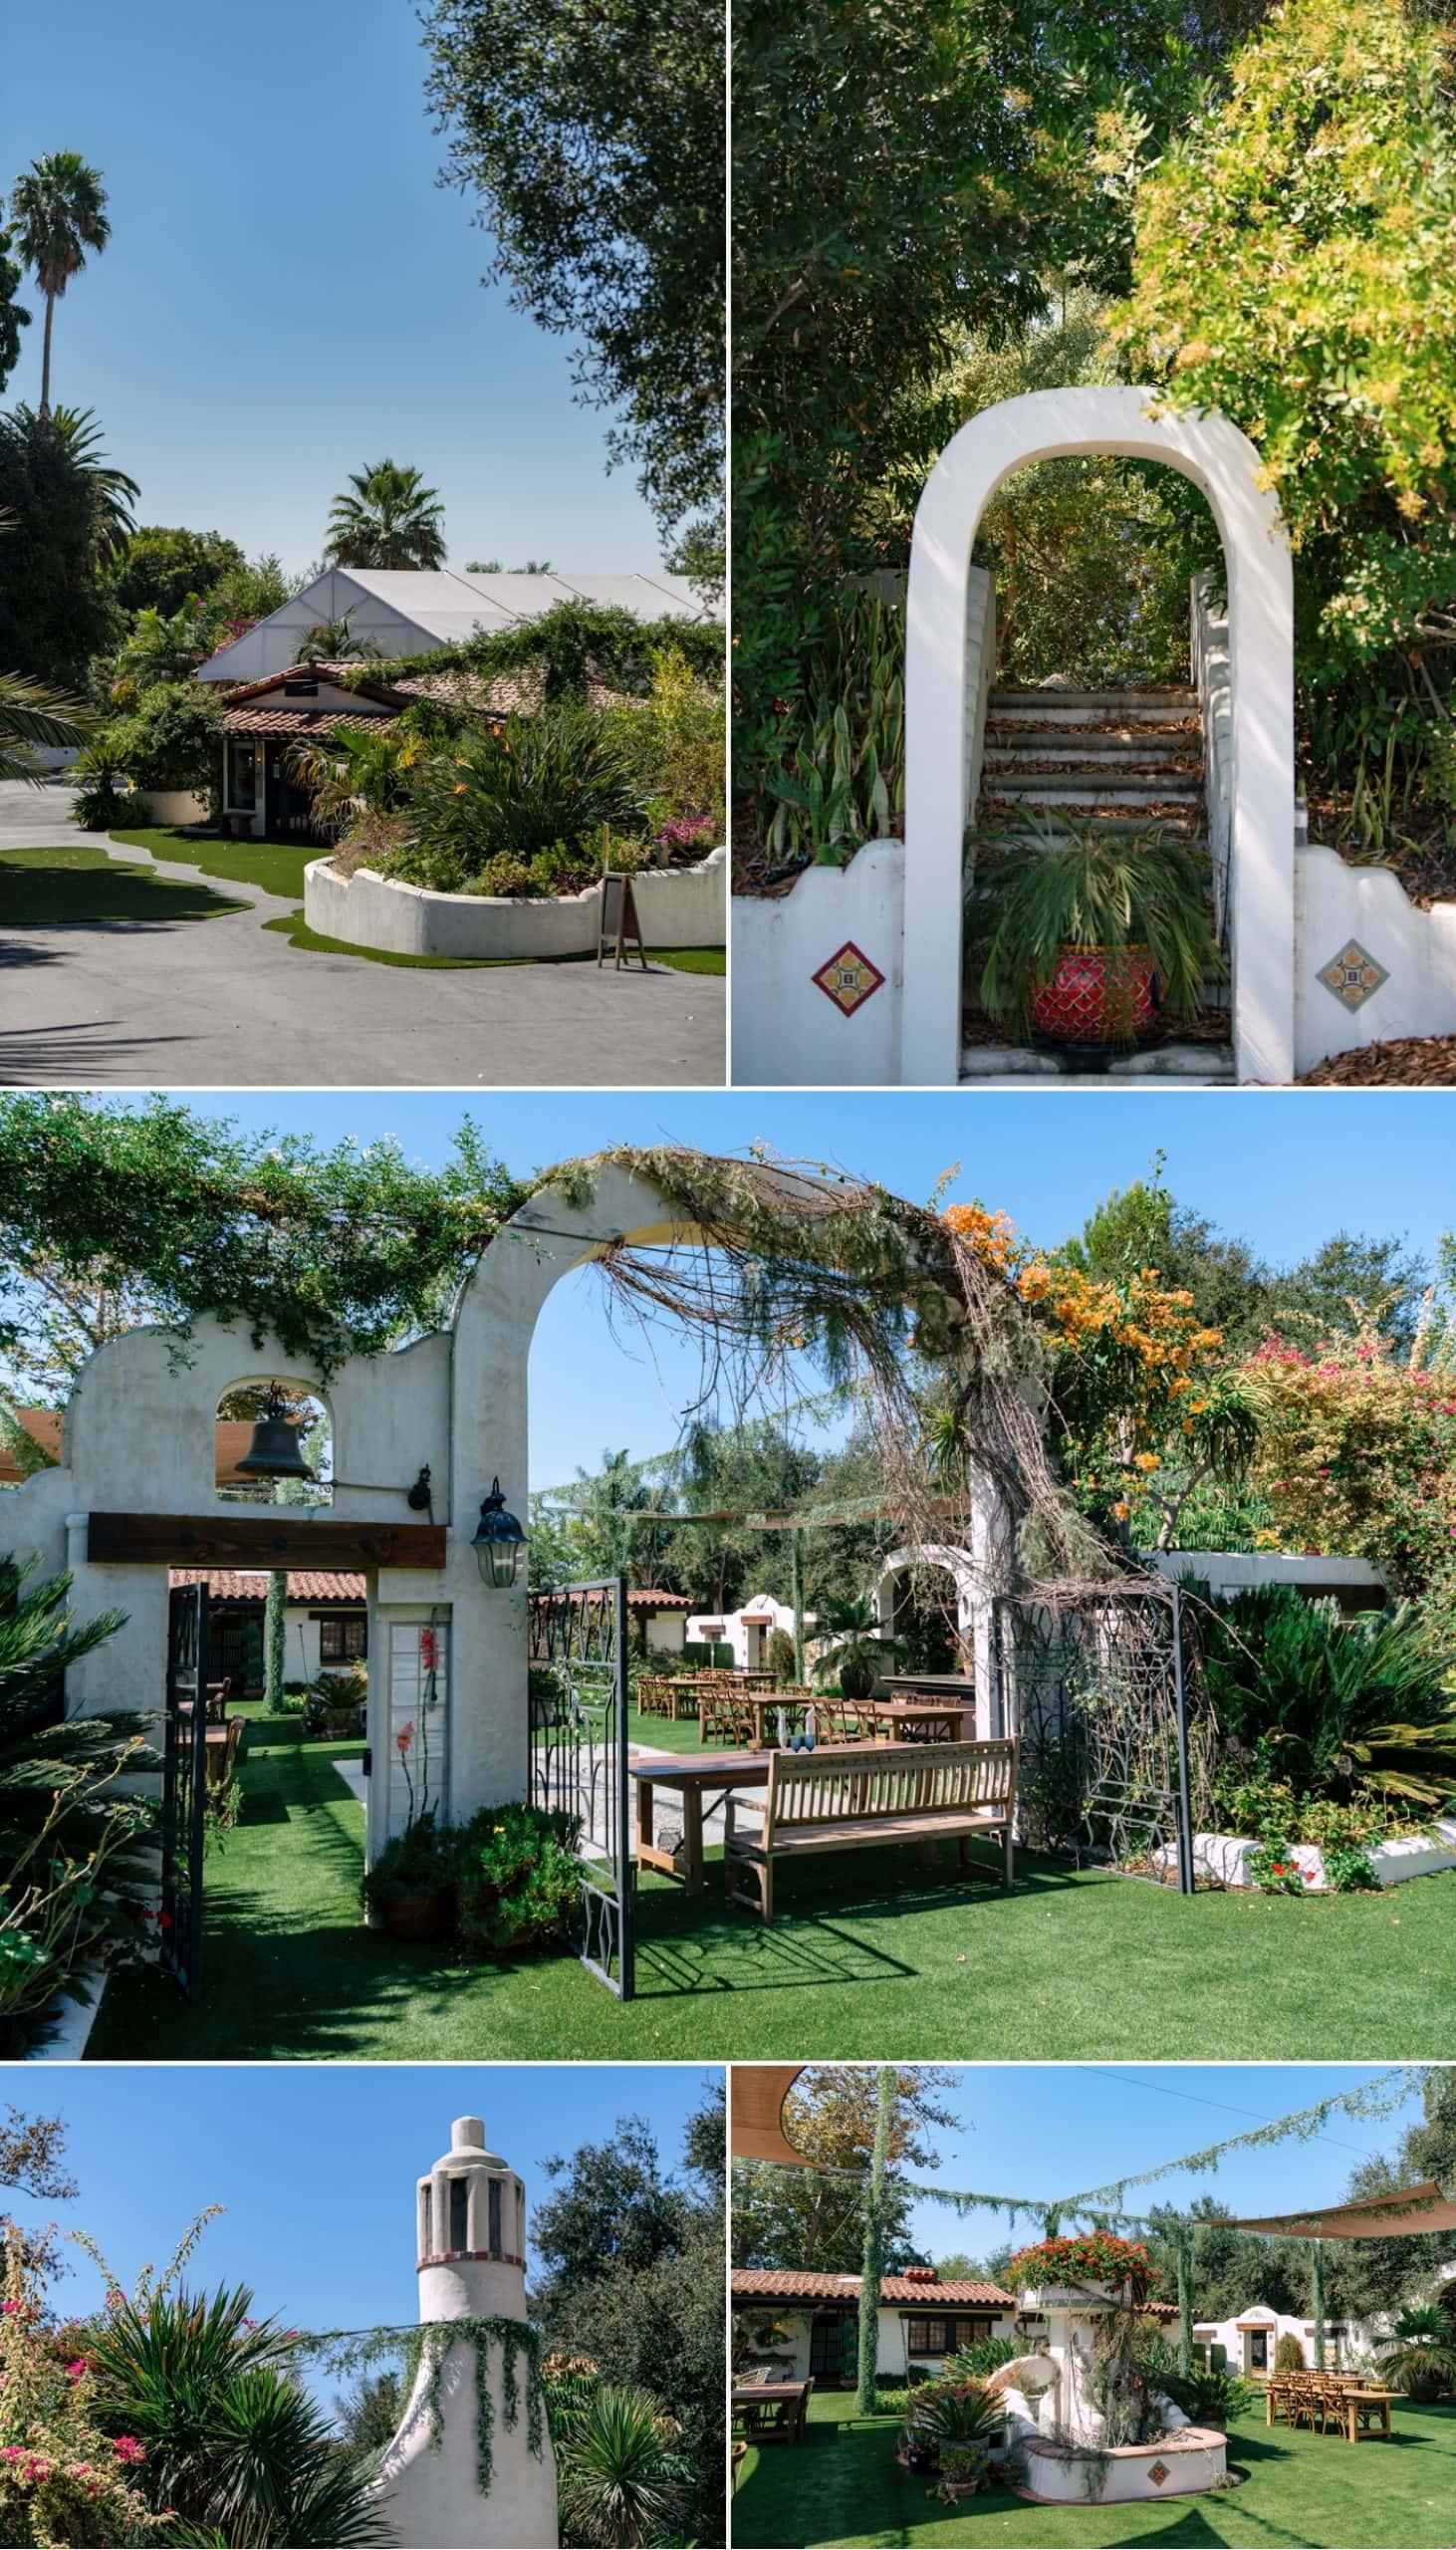 Tivoli Italian Villa Wedding venue in Fallbrook.